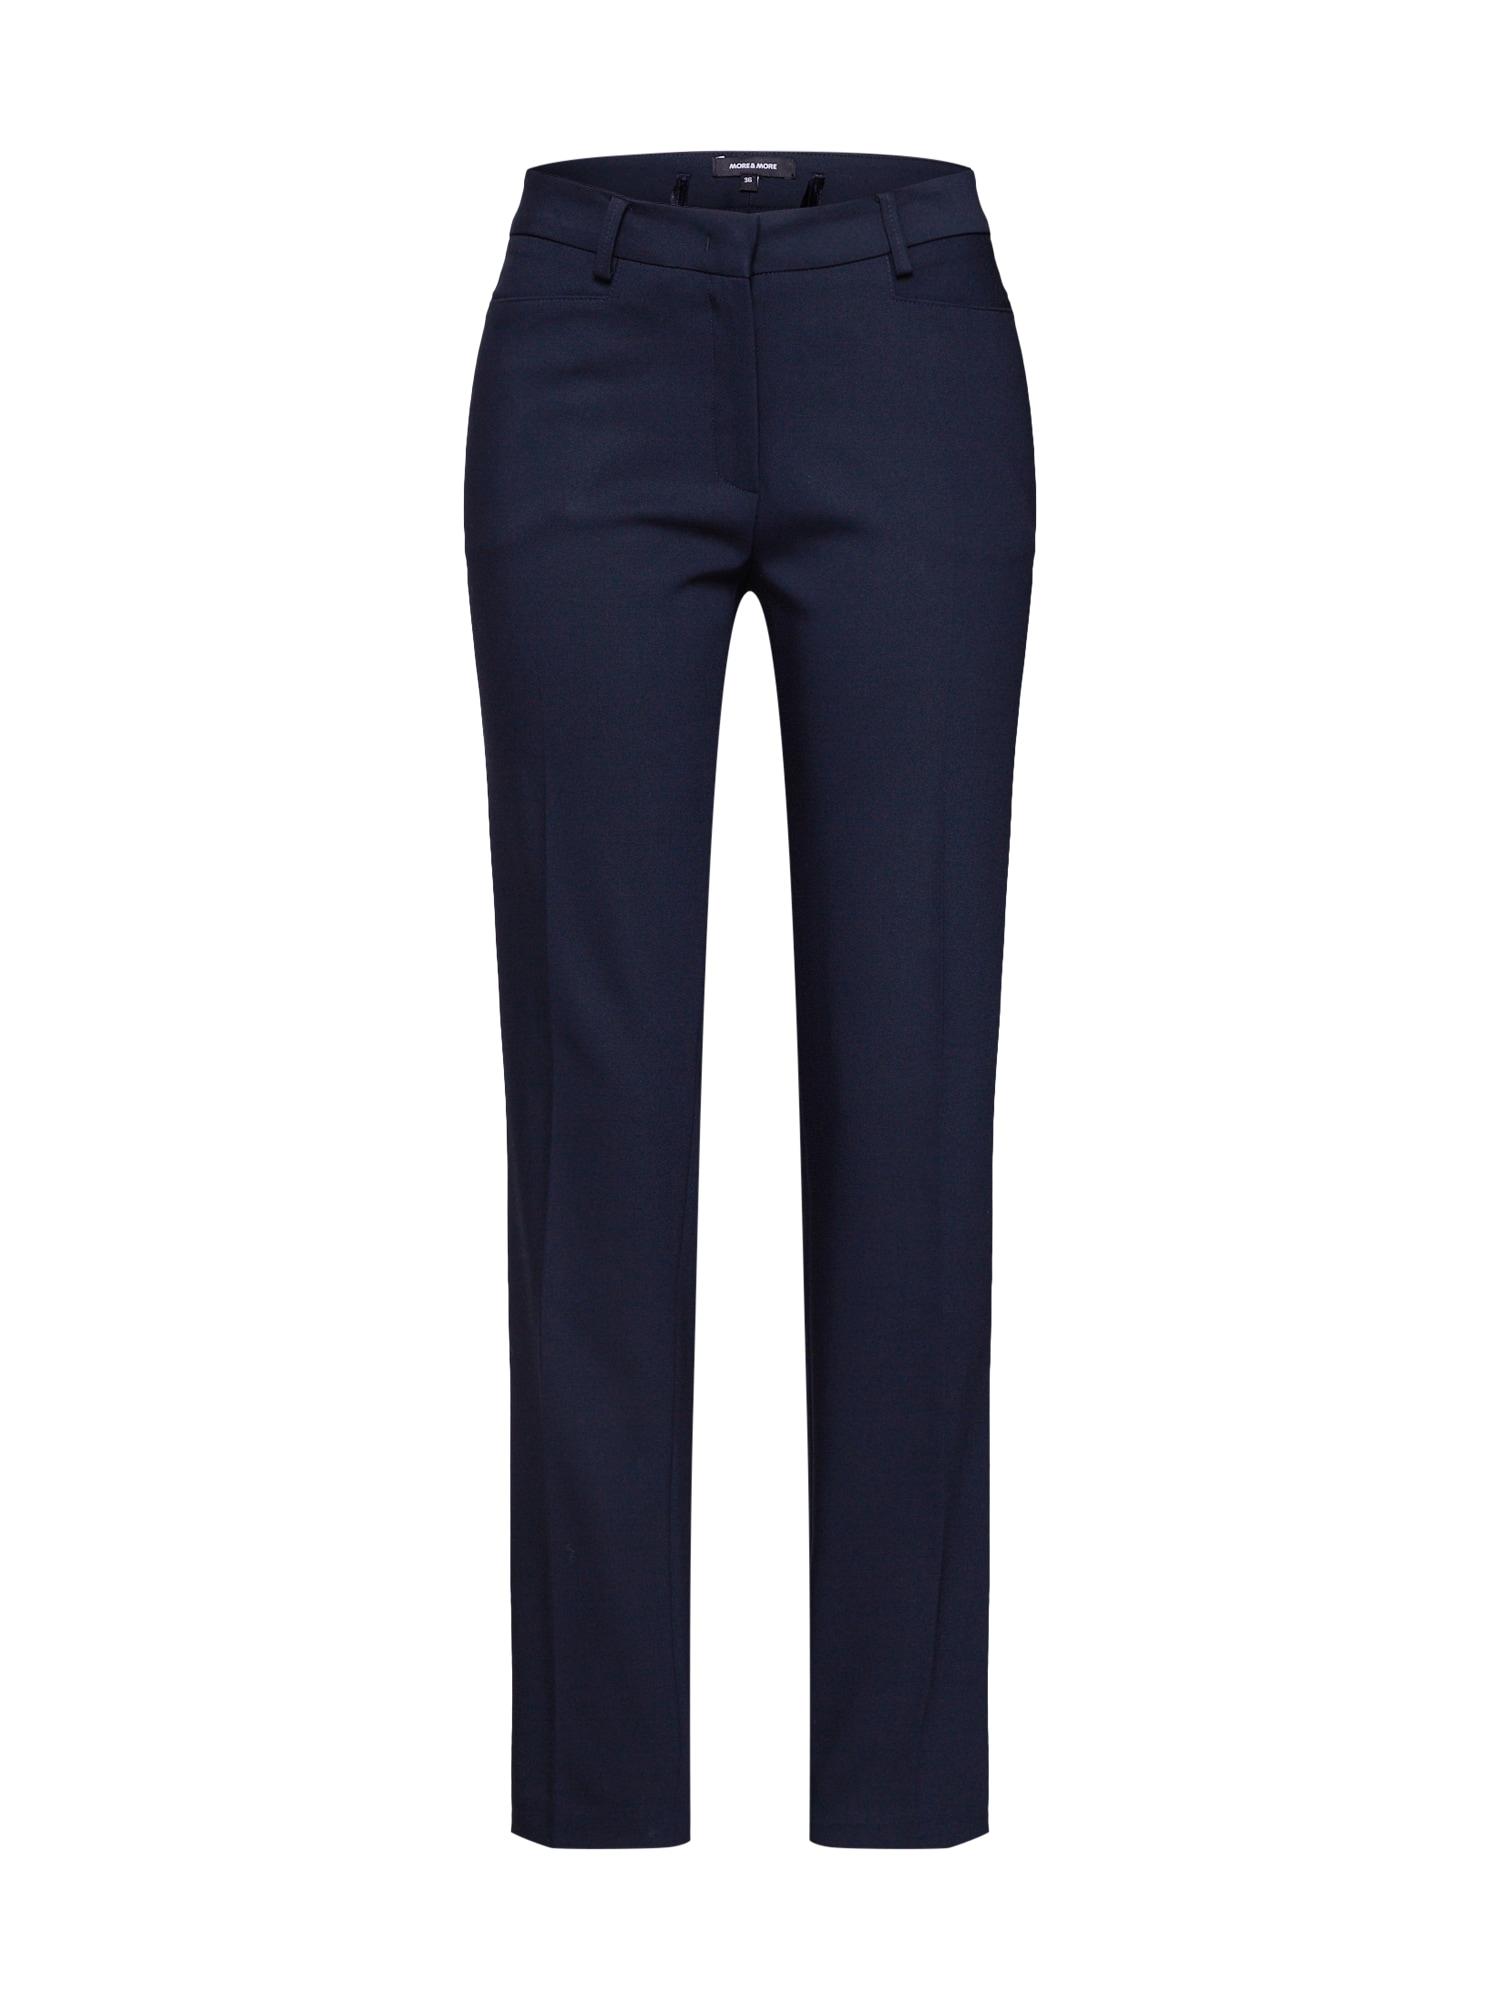 Kalhoty Hedy marine modrá MORE & MORE